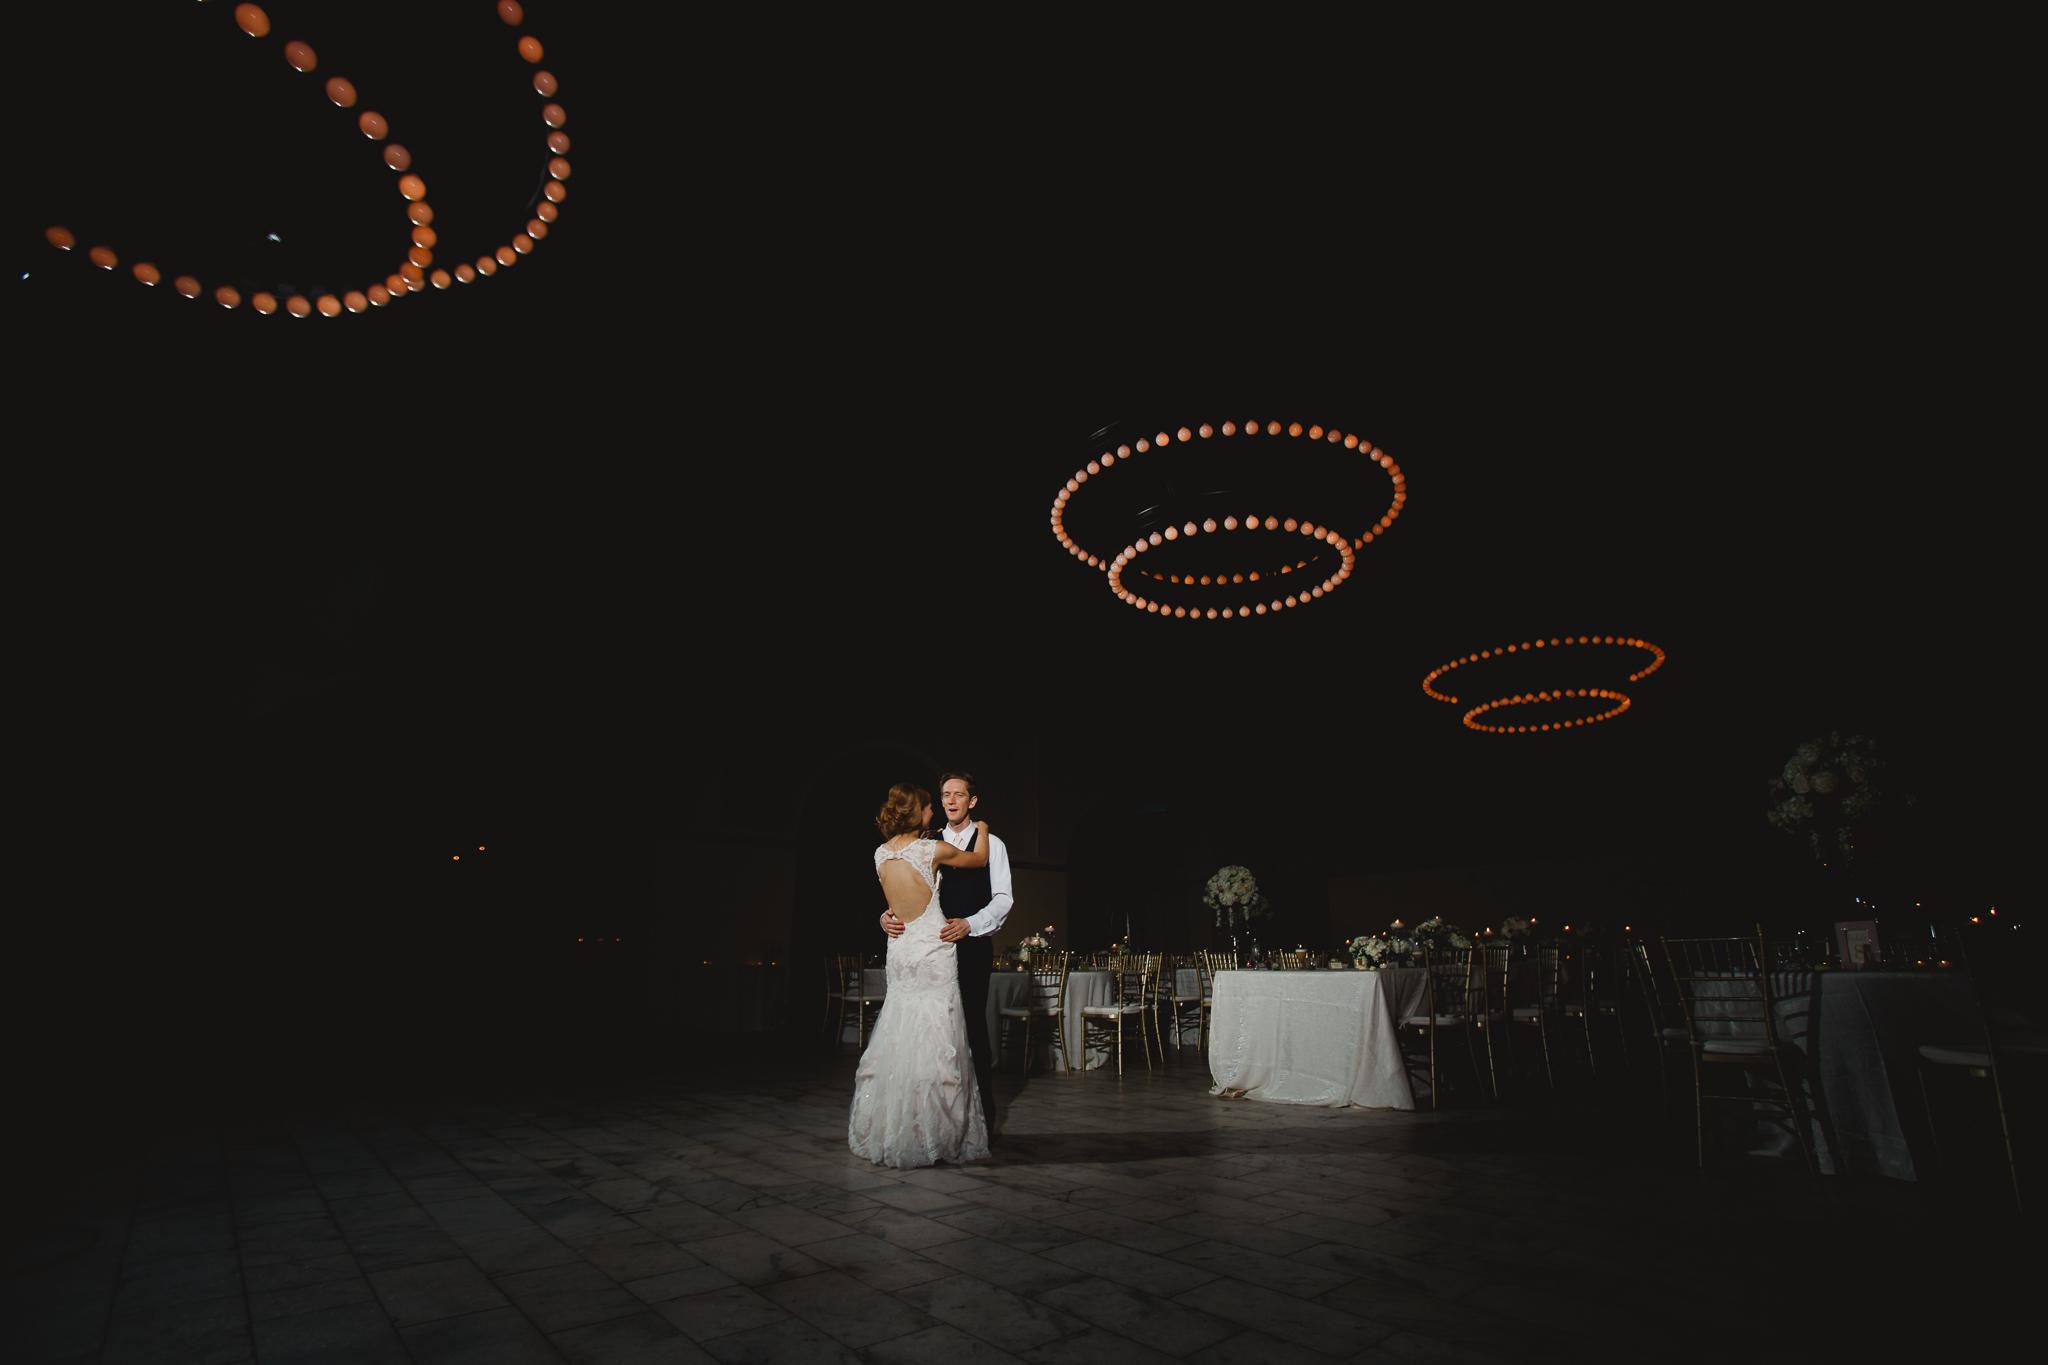 Michael and Kelly - the ashton depot - wedding DFW - wedding photographer- elizalde photography (145 of 150).jpg